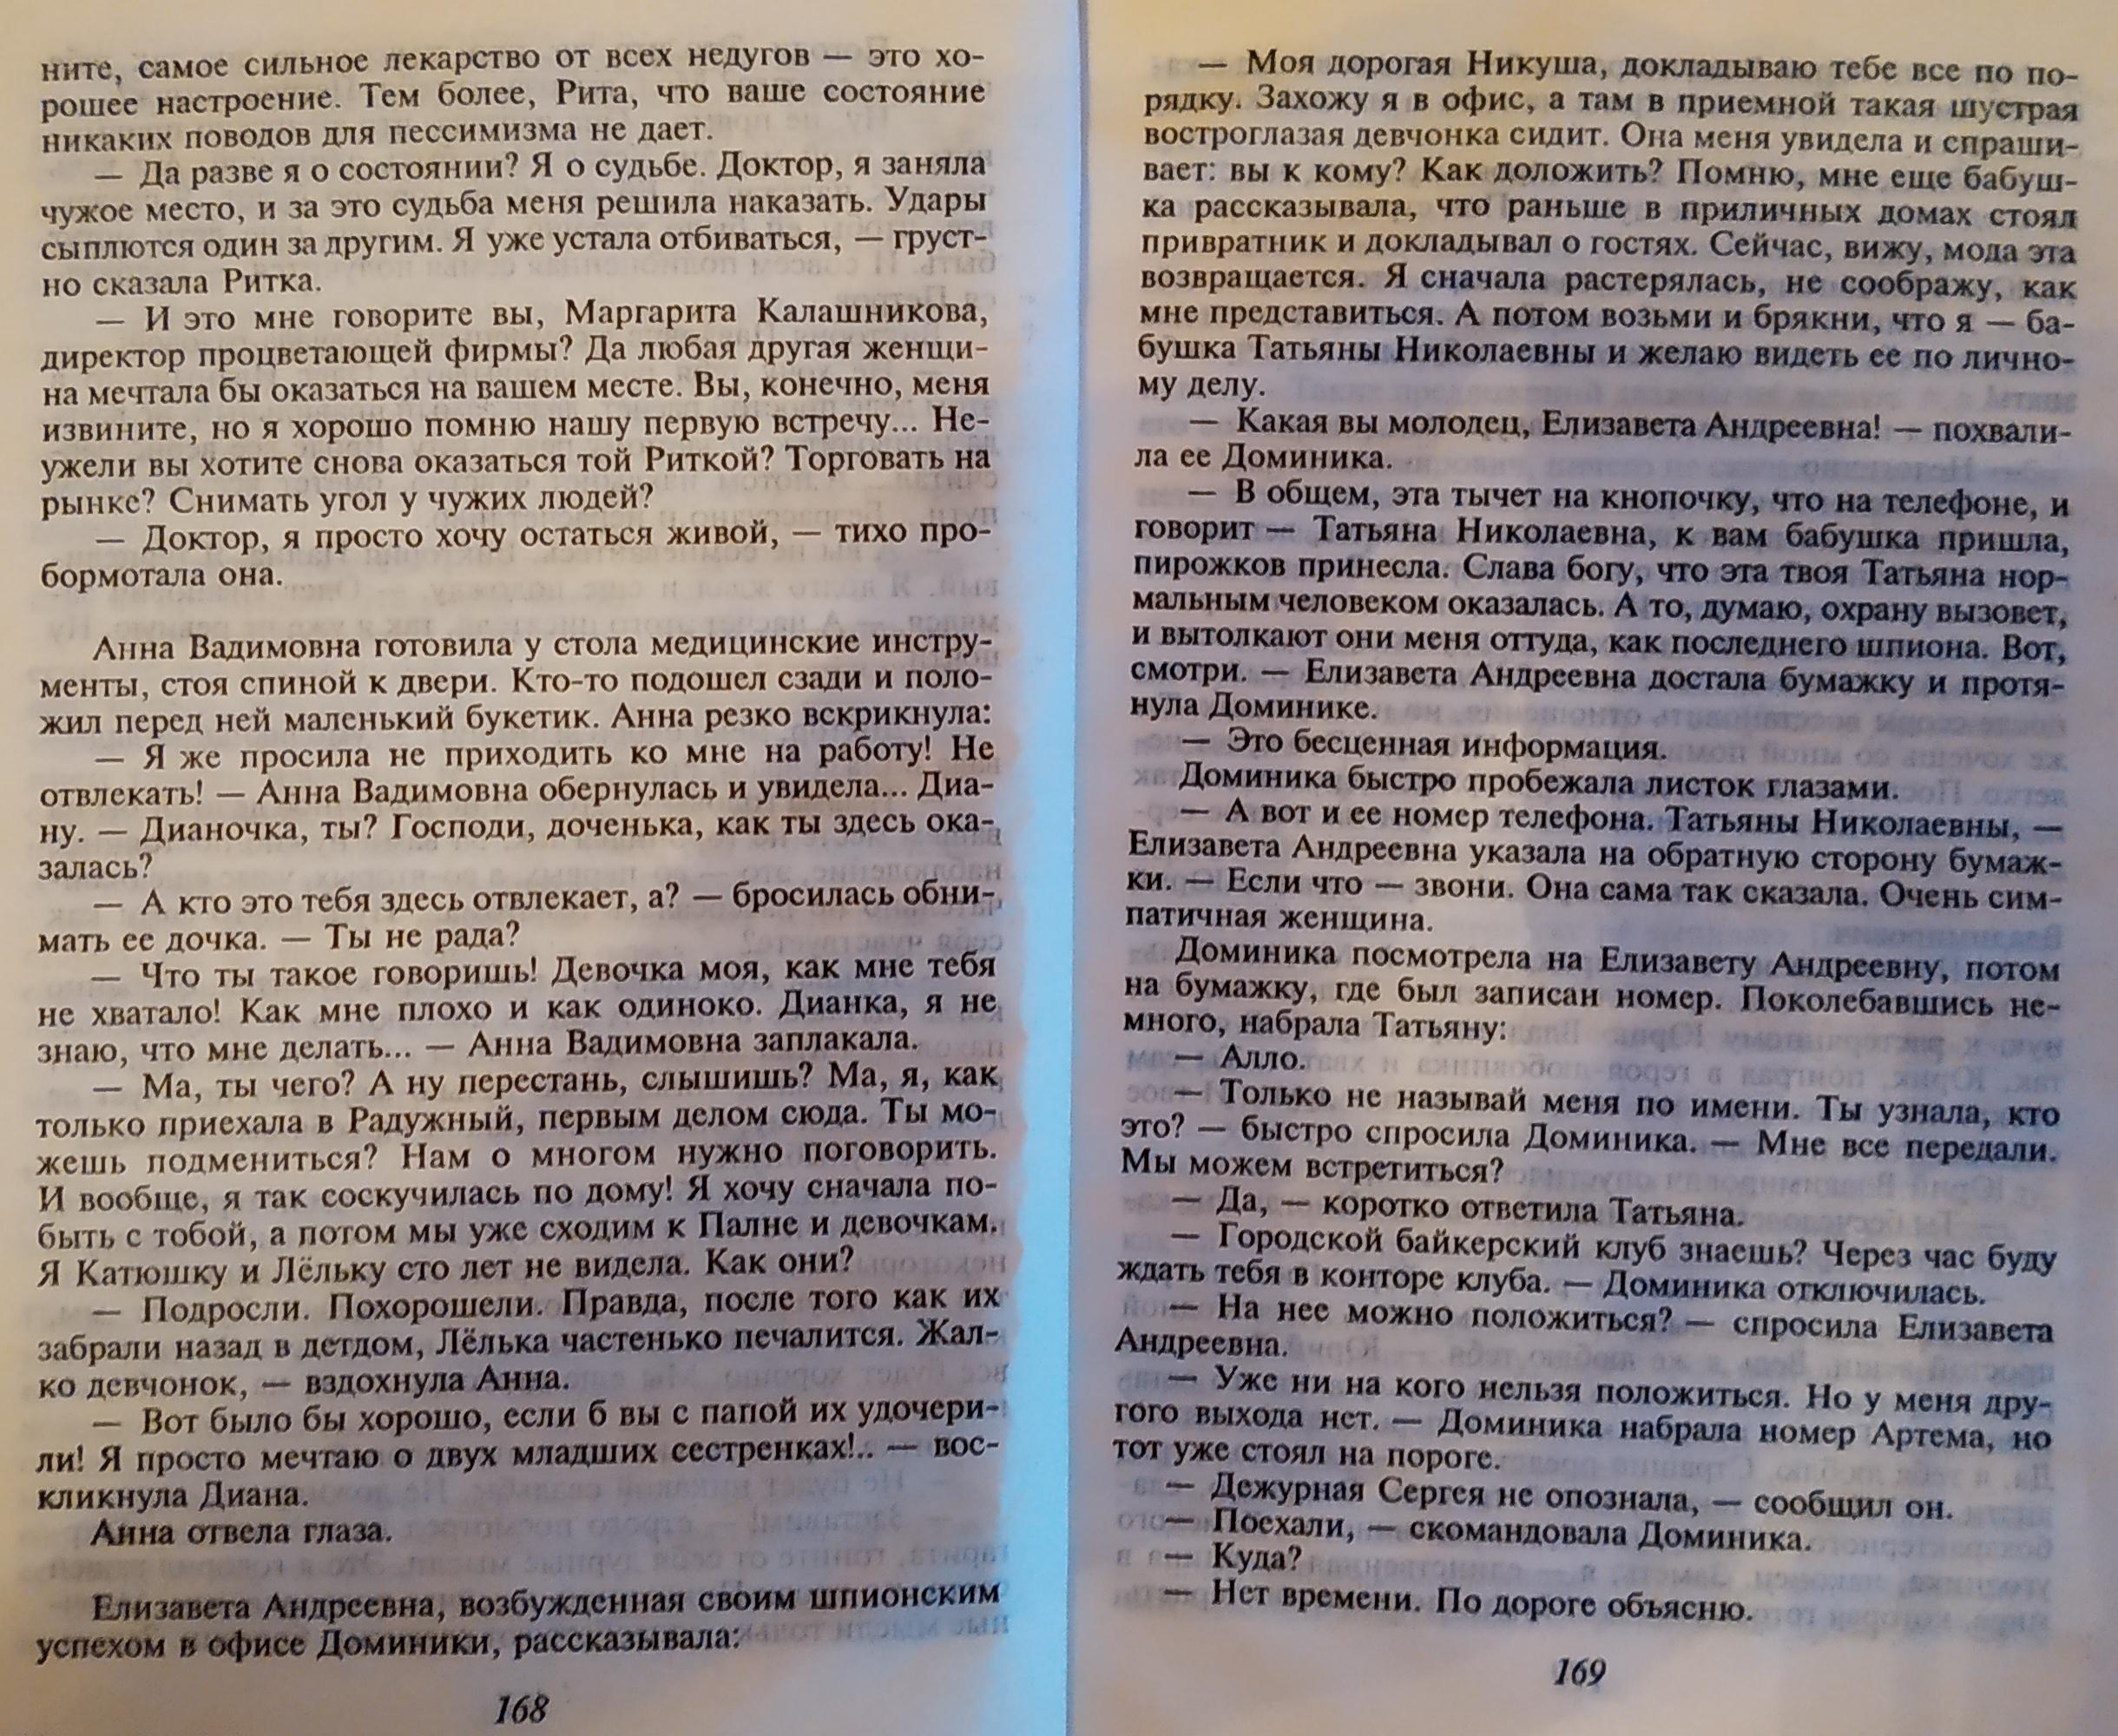 http://s5.uploads.ru/w8fD0.jpg